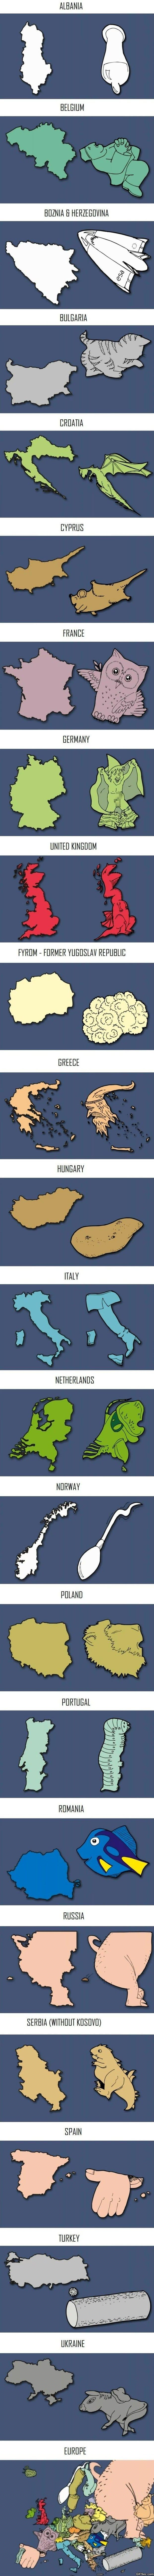 europe-according-to-creative-people